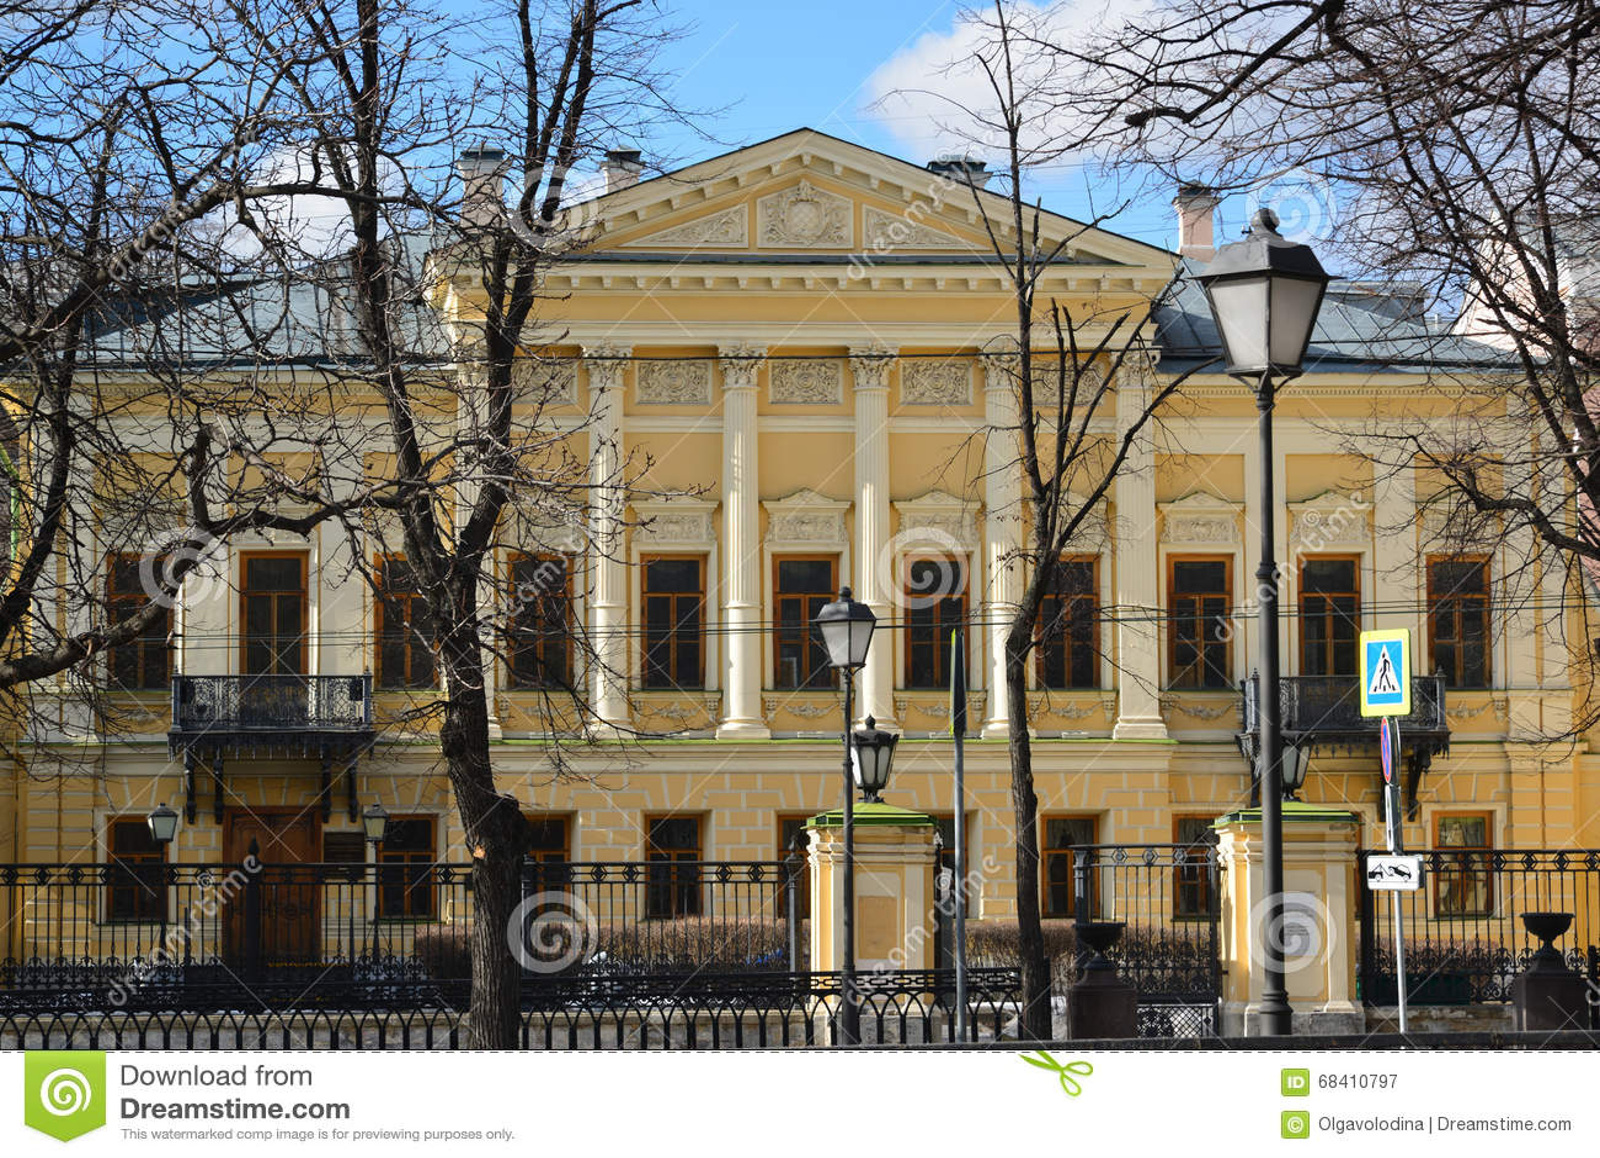 Bibliotheksname des Dichters Pushkin, ehemaliger Zustand Mamontov in Moskau, Russland